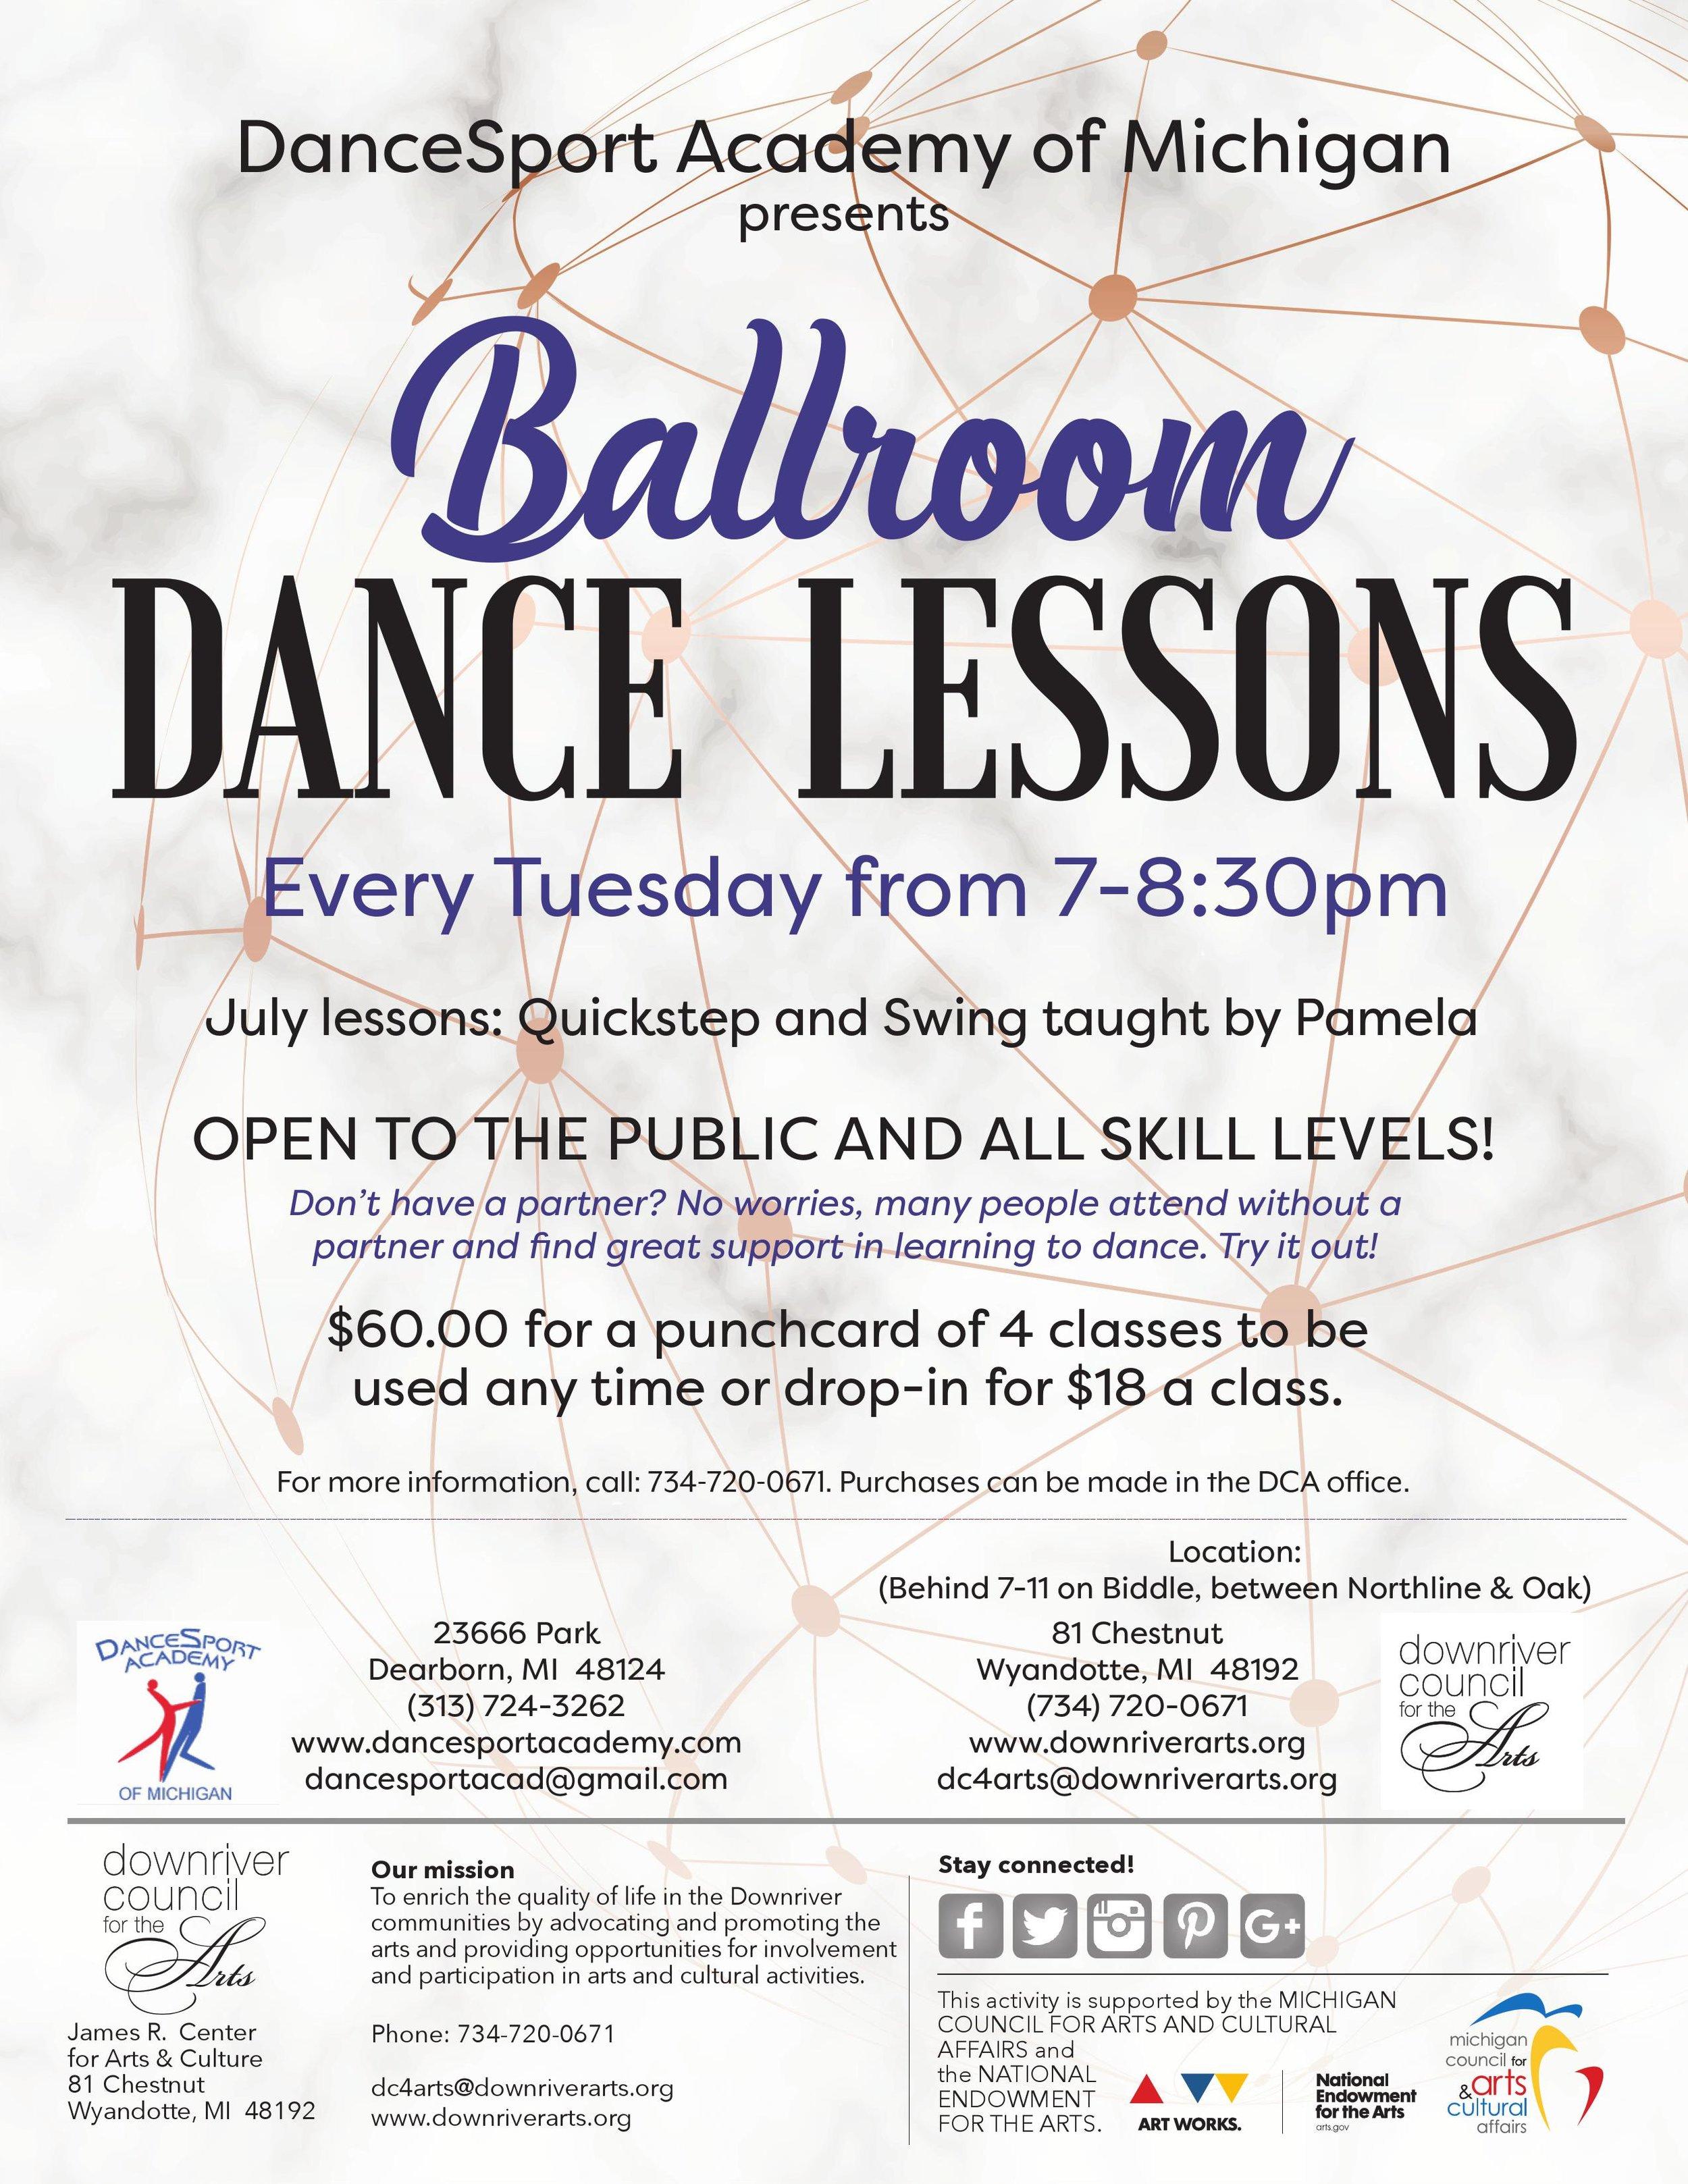 July 19 DanceLessons_00001.jpg